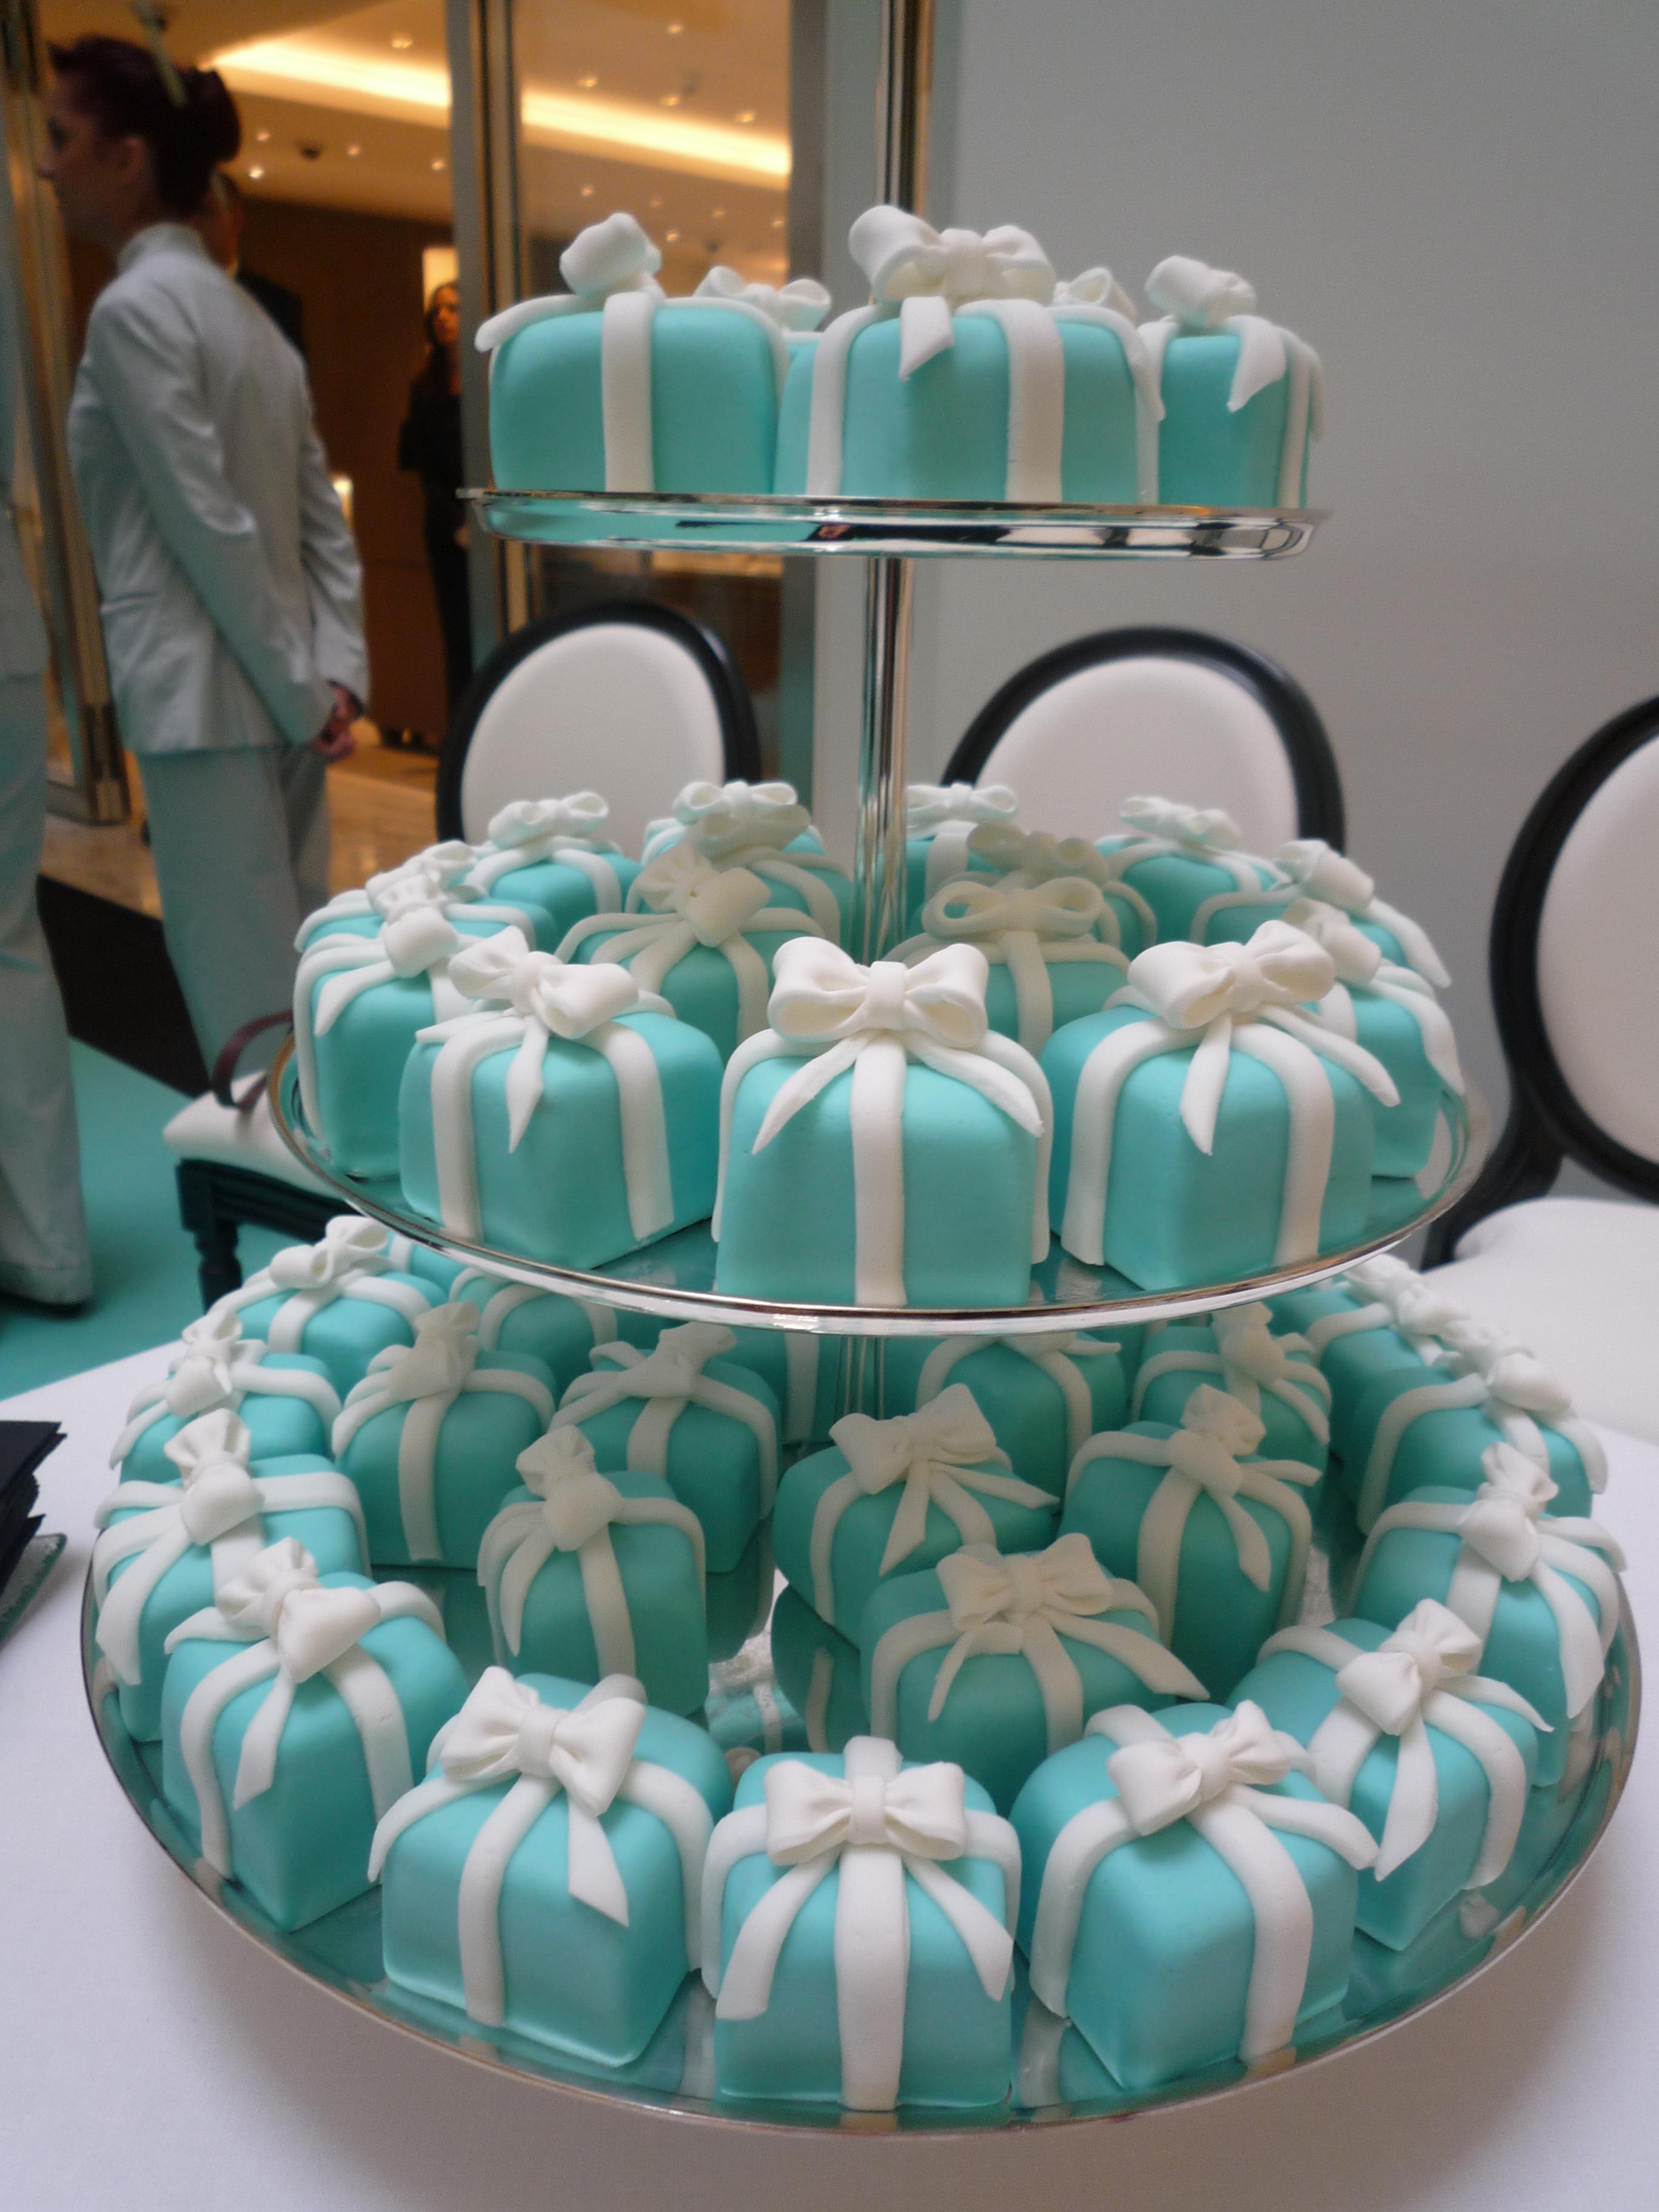 Incredibly Creative Cupcake Designs Maple Pecan Pancakes